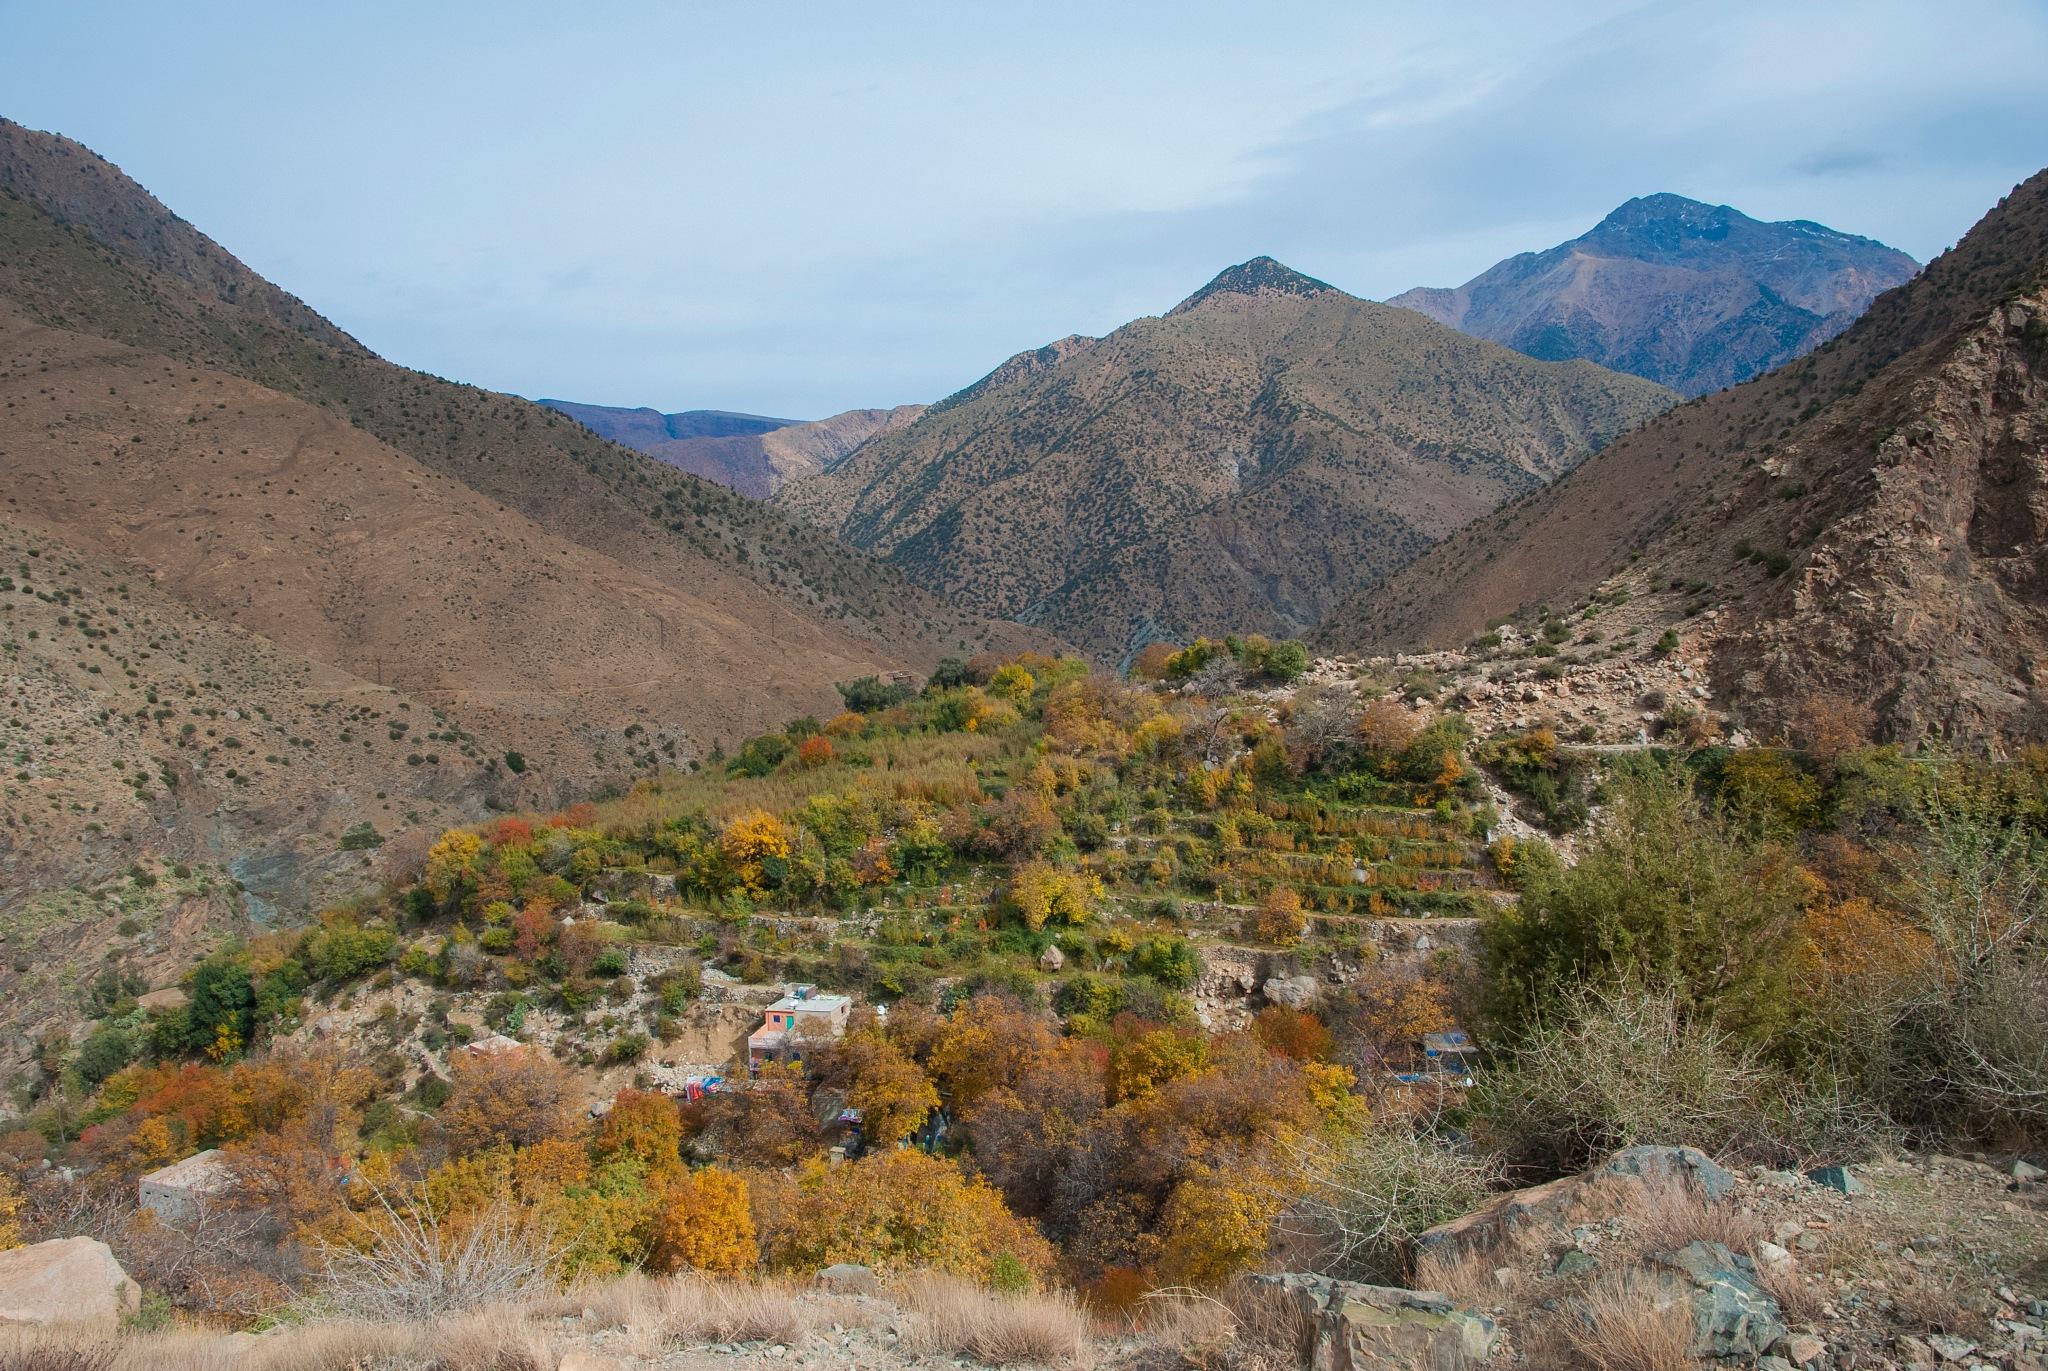 Atlas Mountains Near Marrakech by GWHMantel